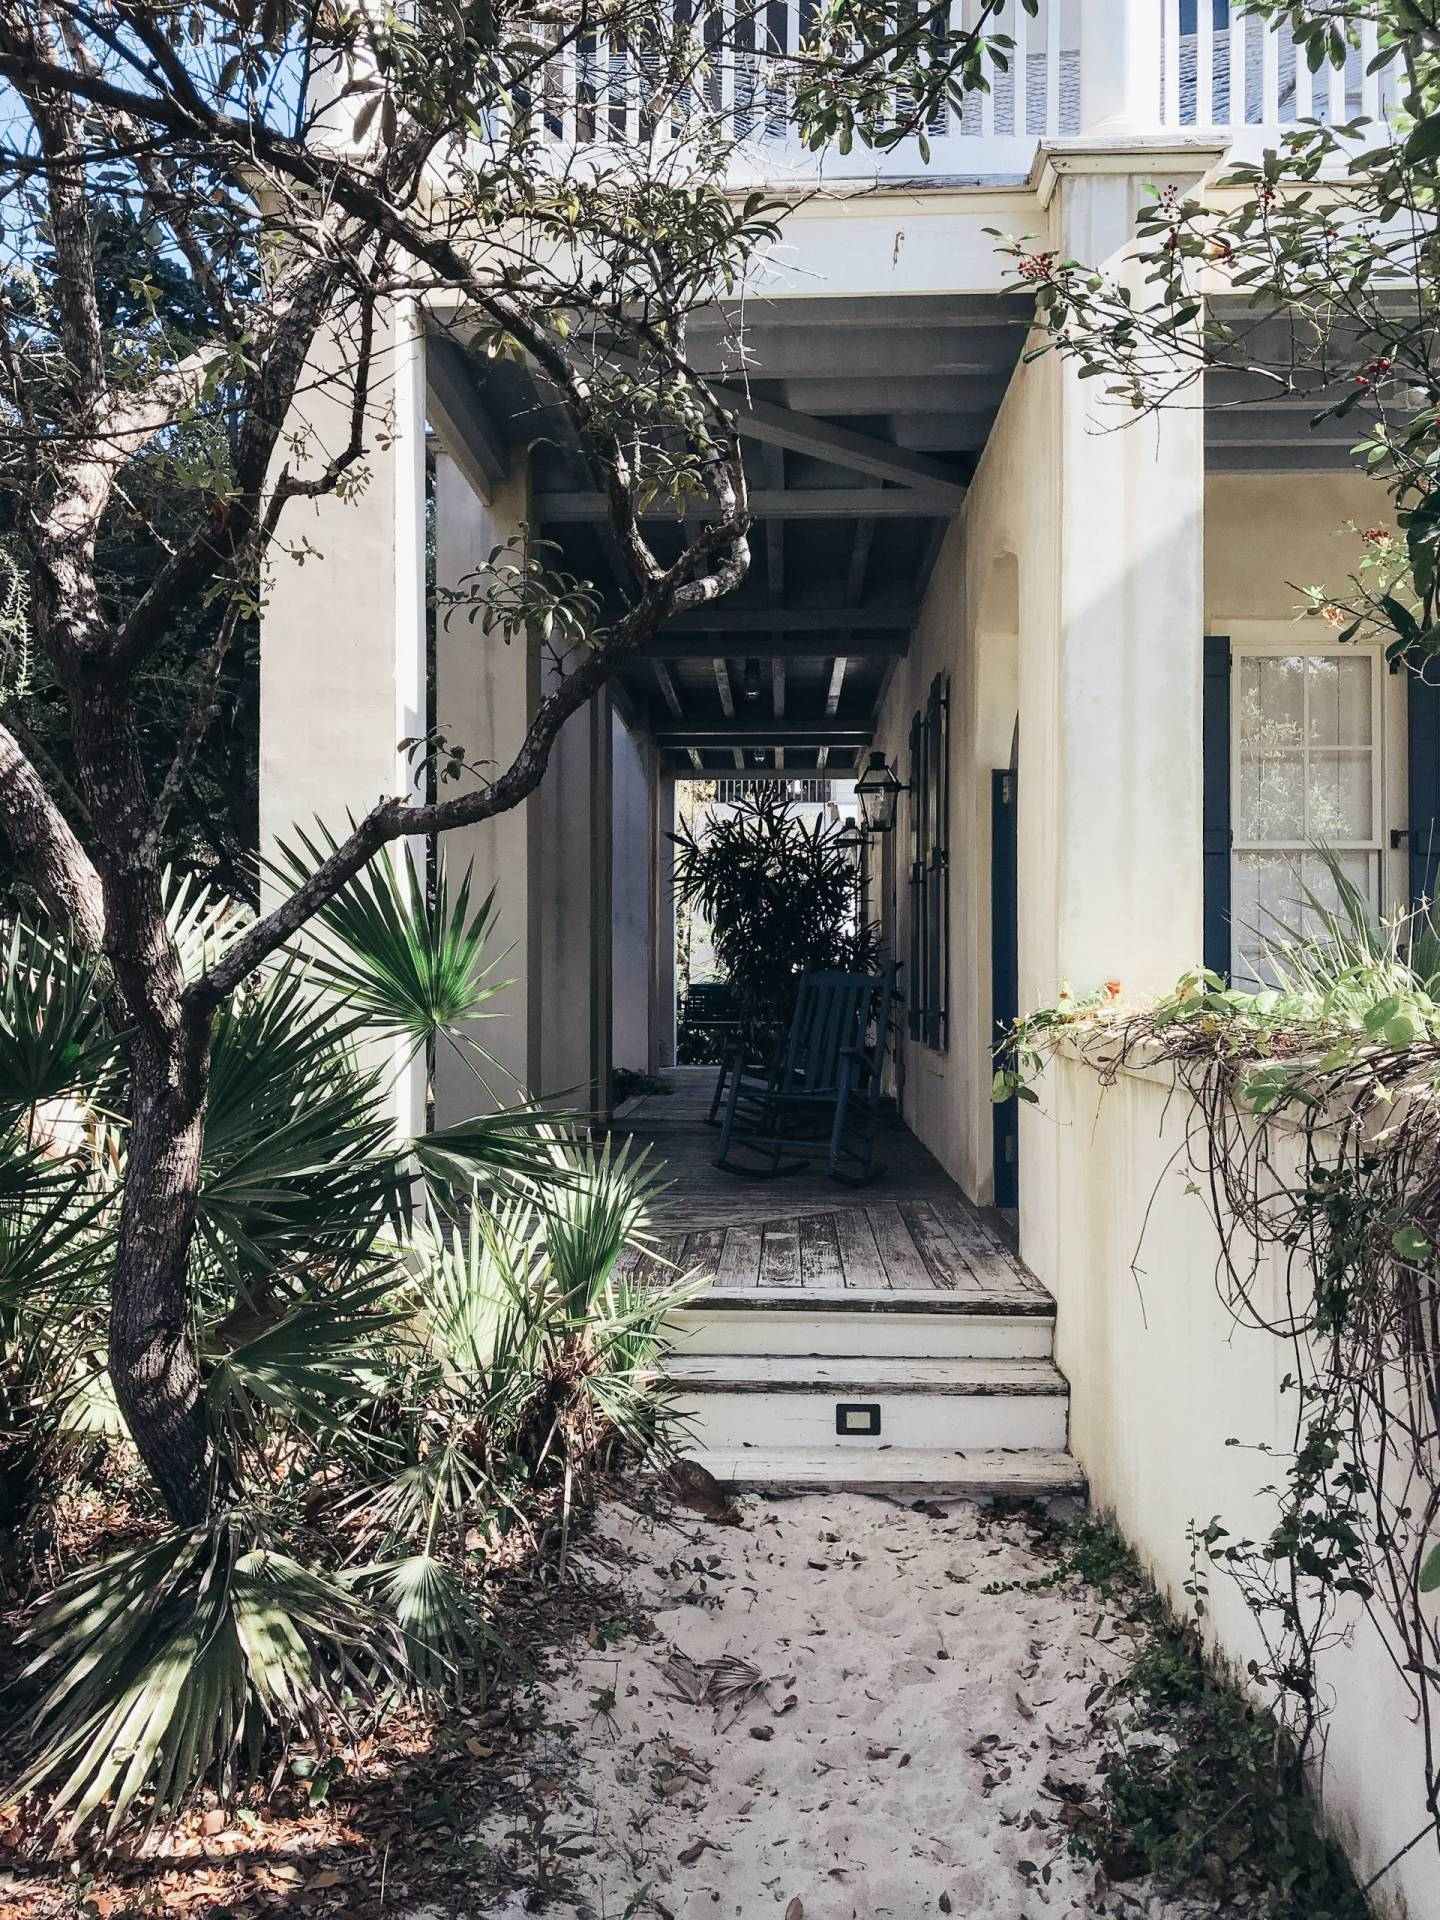 Colonial Caribbean Style Home Rosemary Beach 30A Florida